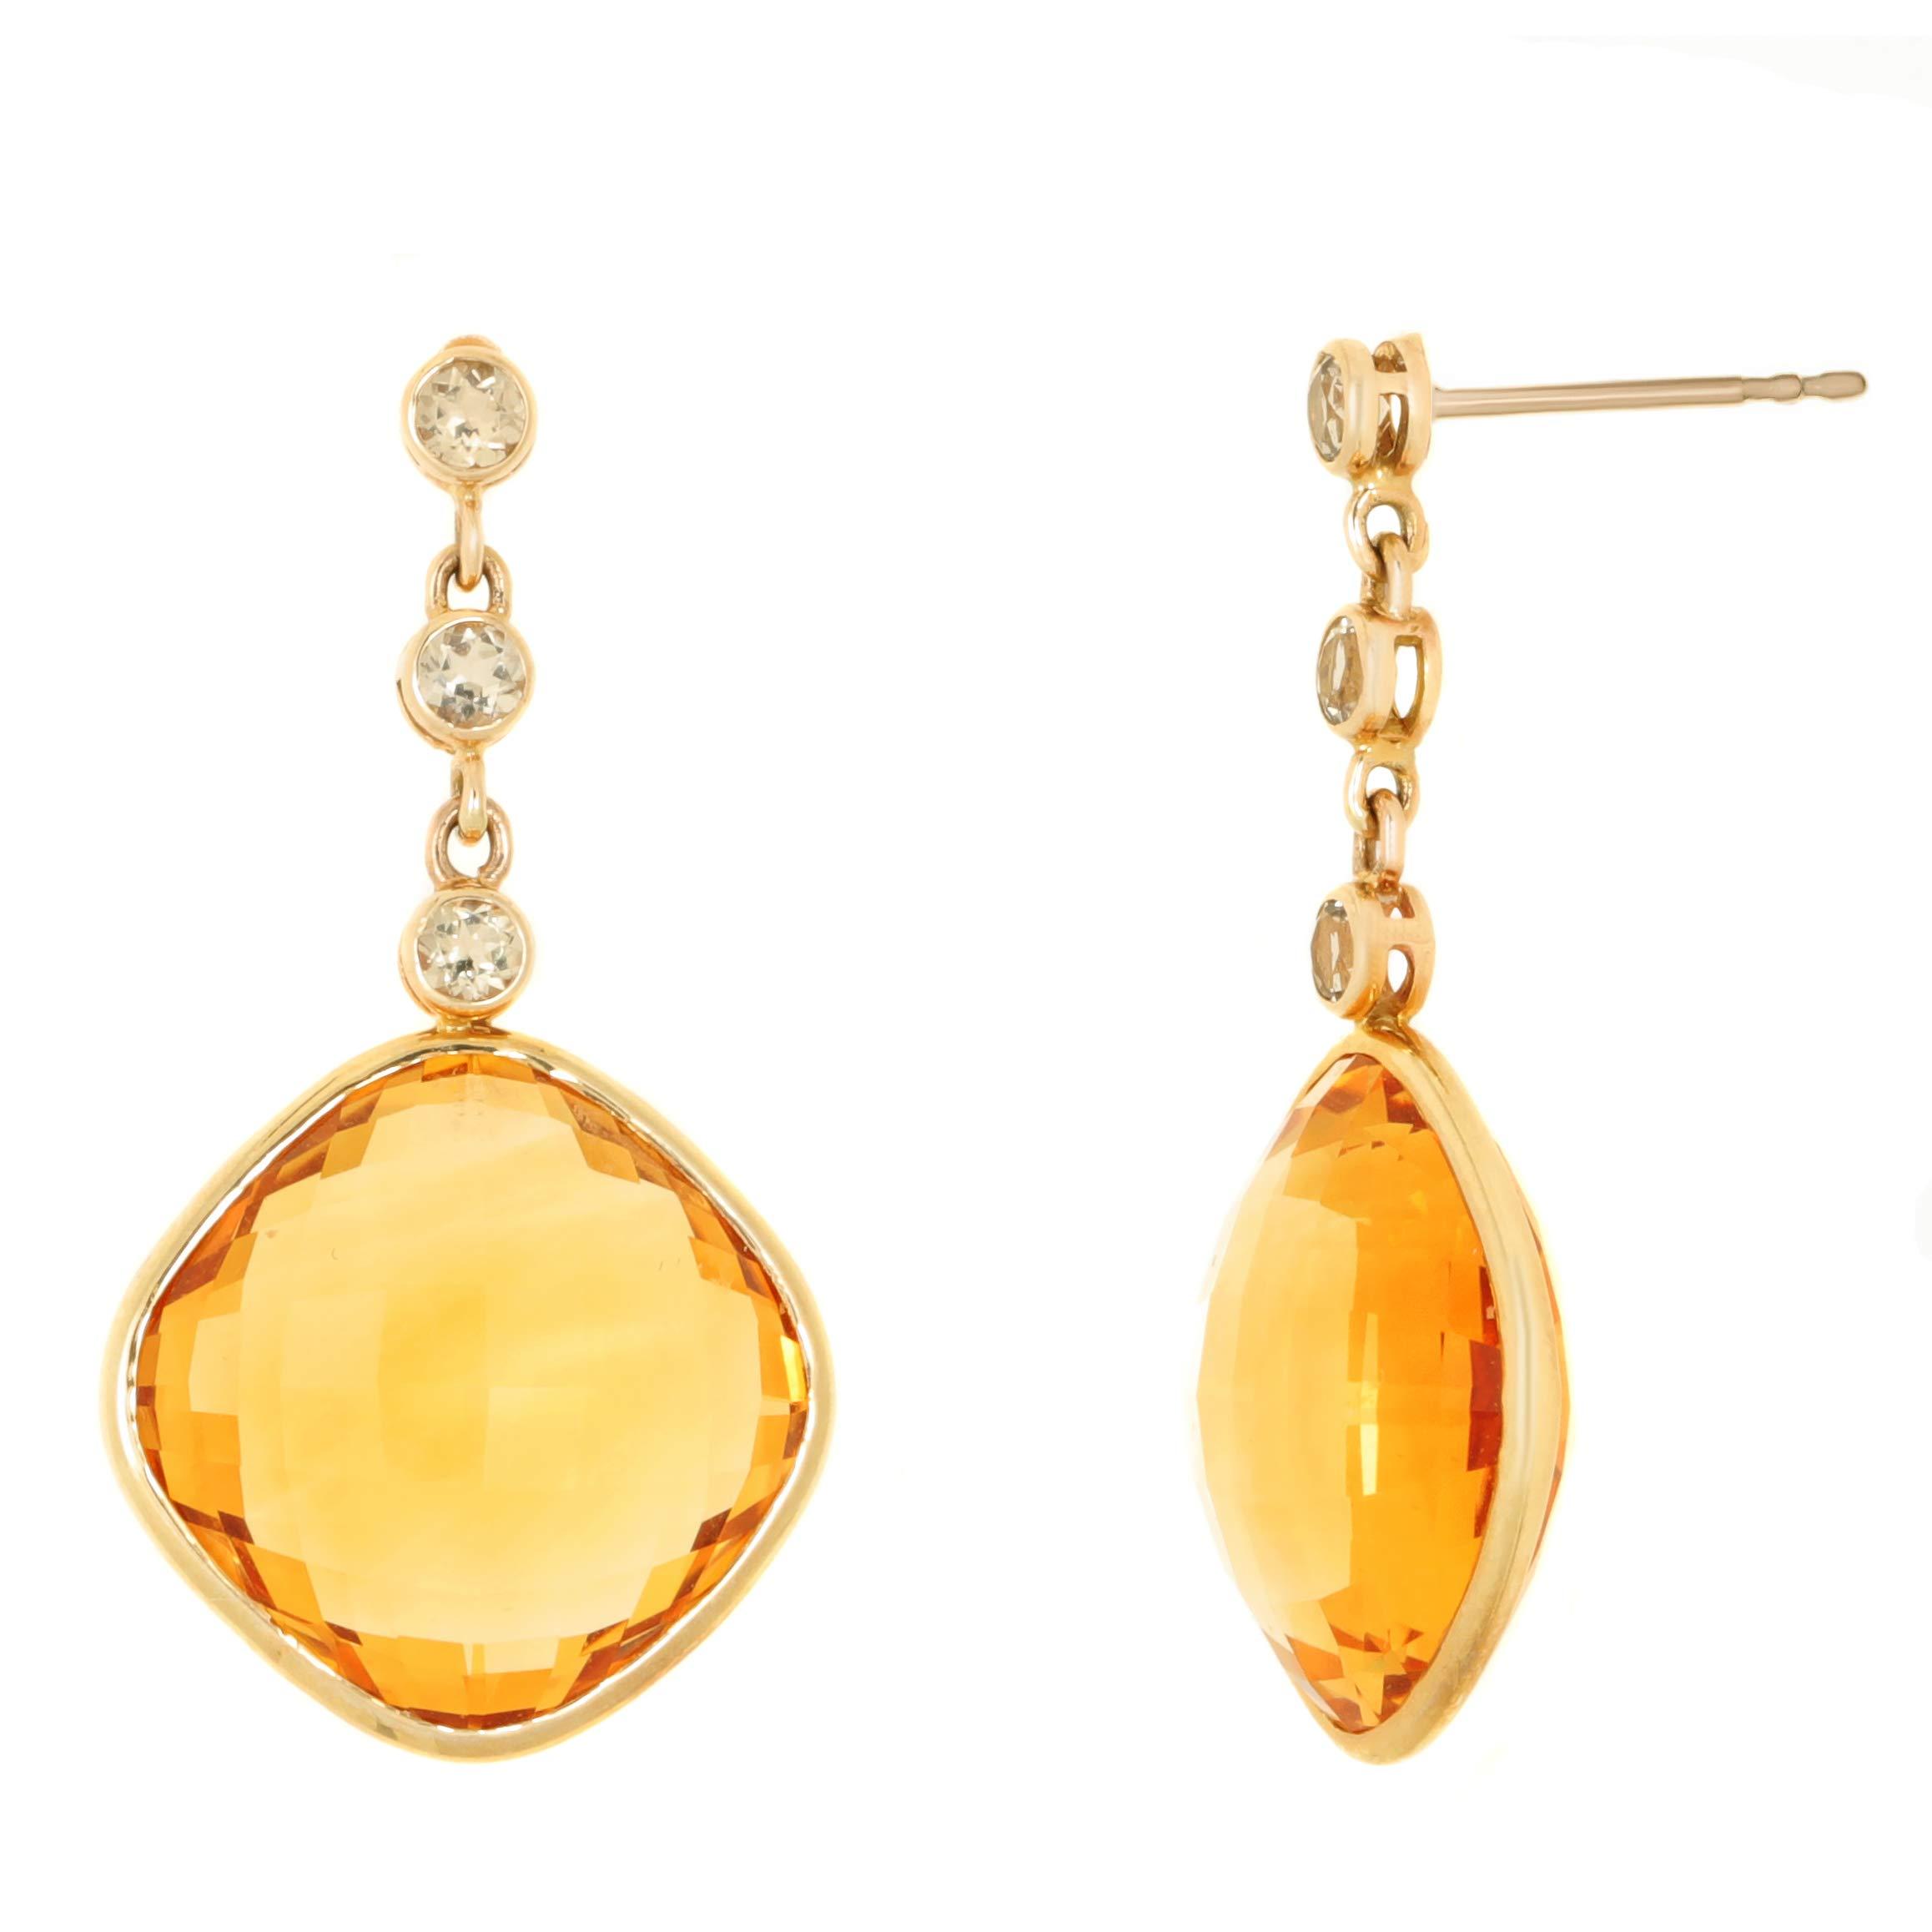 Lavari - 14MM Cushion Shaped Citrine 2.5MM White Topaz 14K Yellow Gold Dangling Earrings